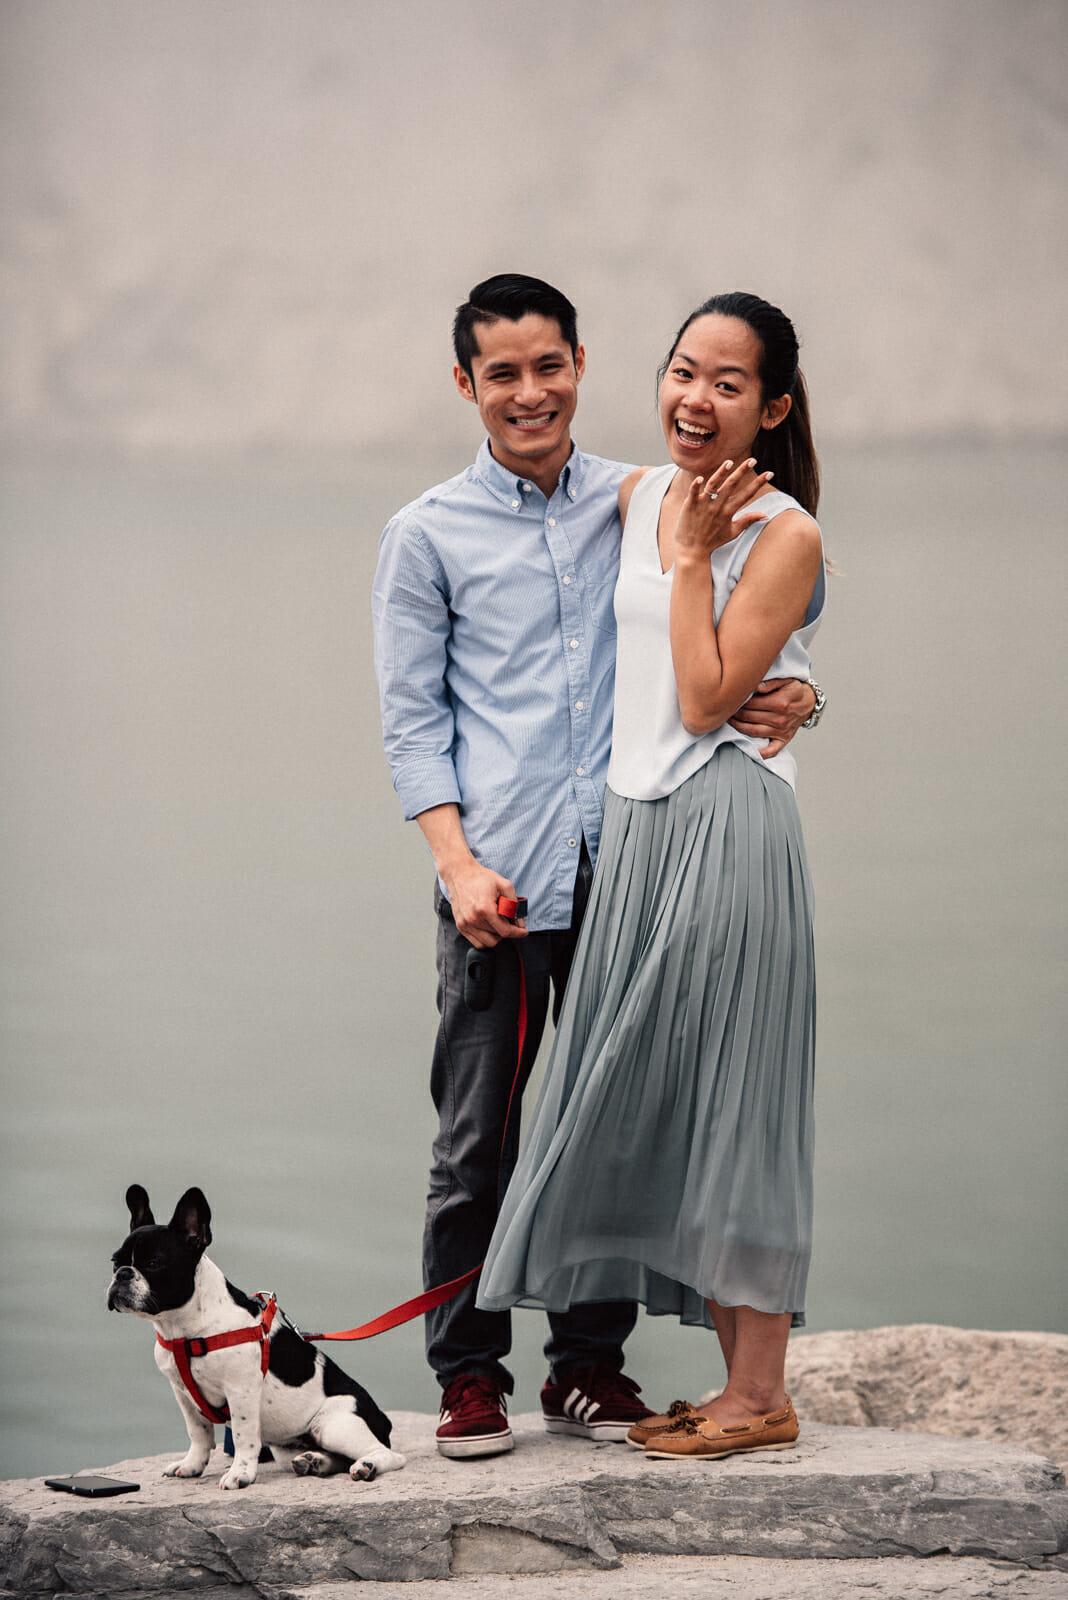 toronto proposal photographer